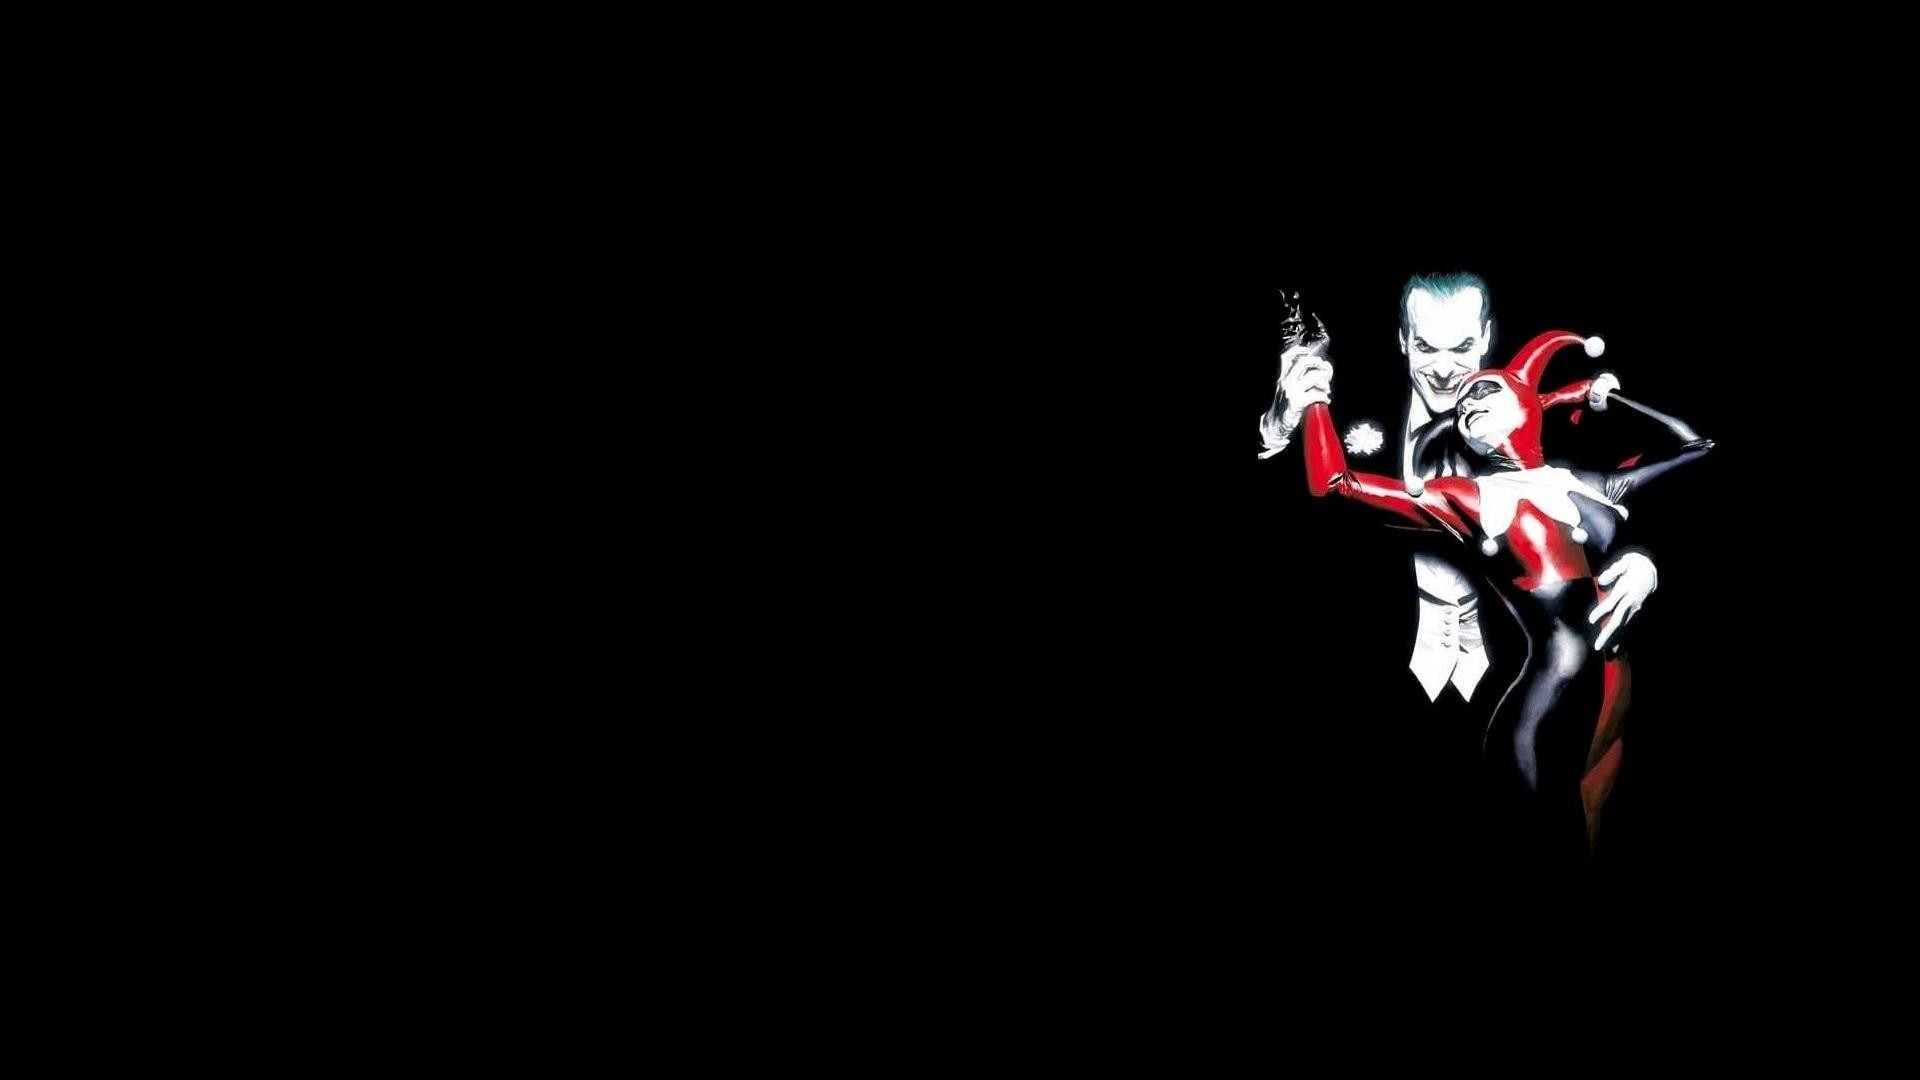 Joker Harley Quinn Wallpapers HD Desktop and Mobile 1920x1080